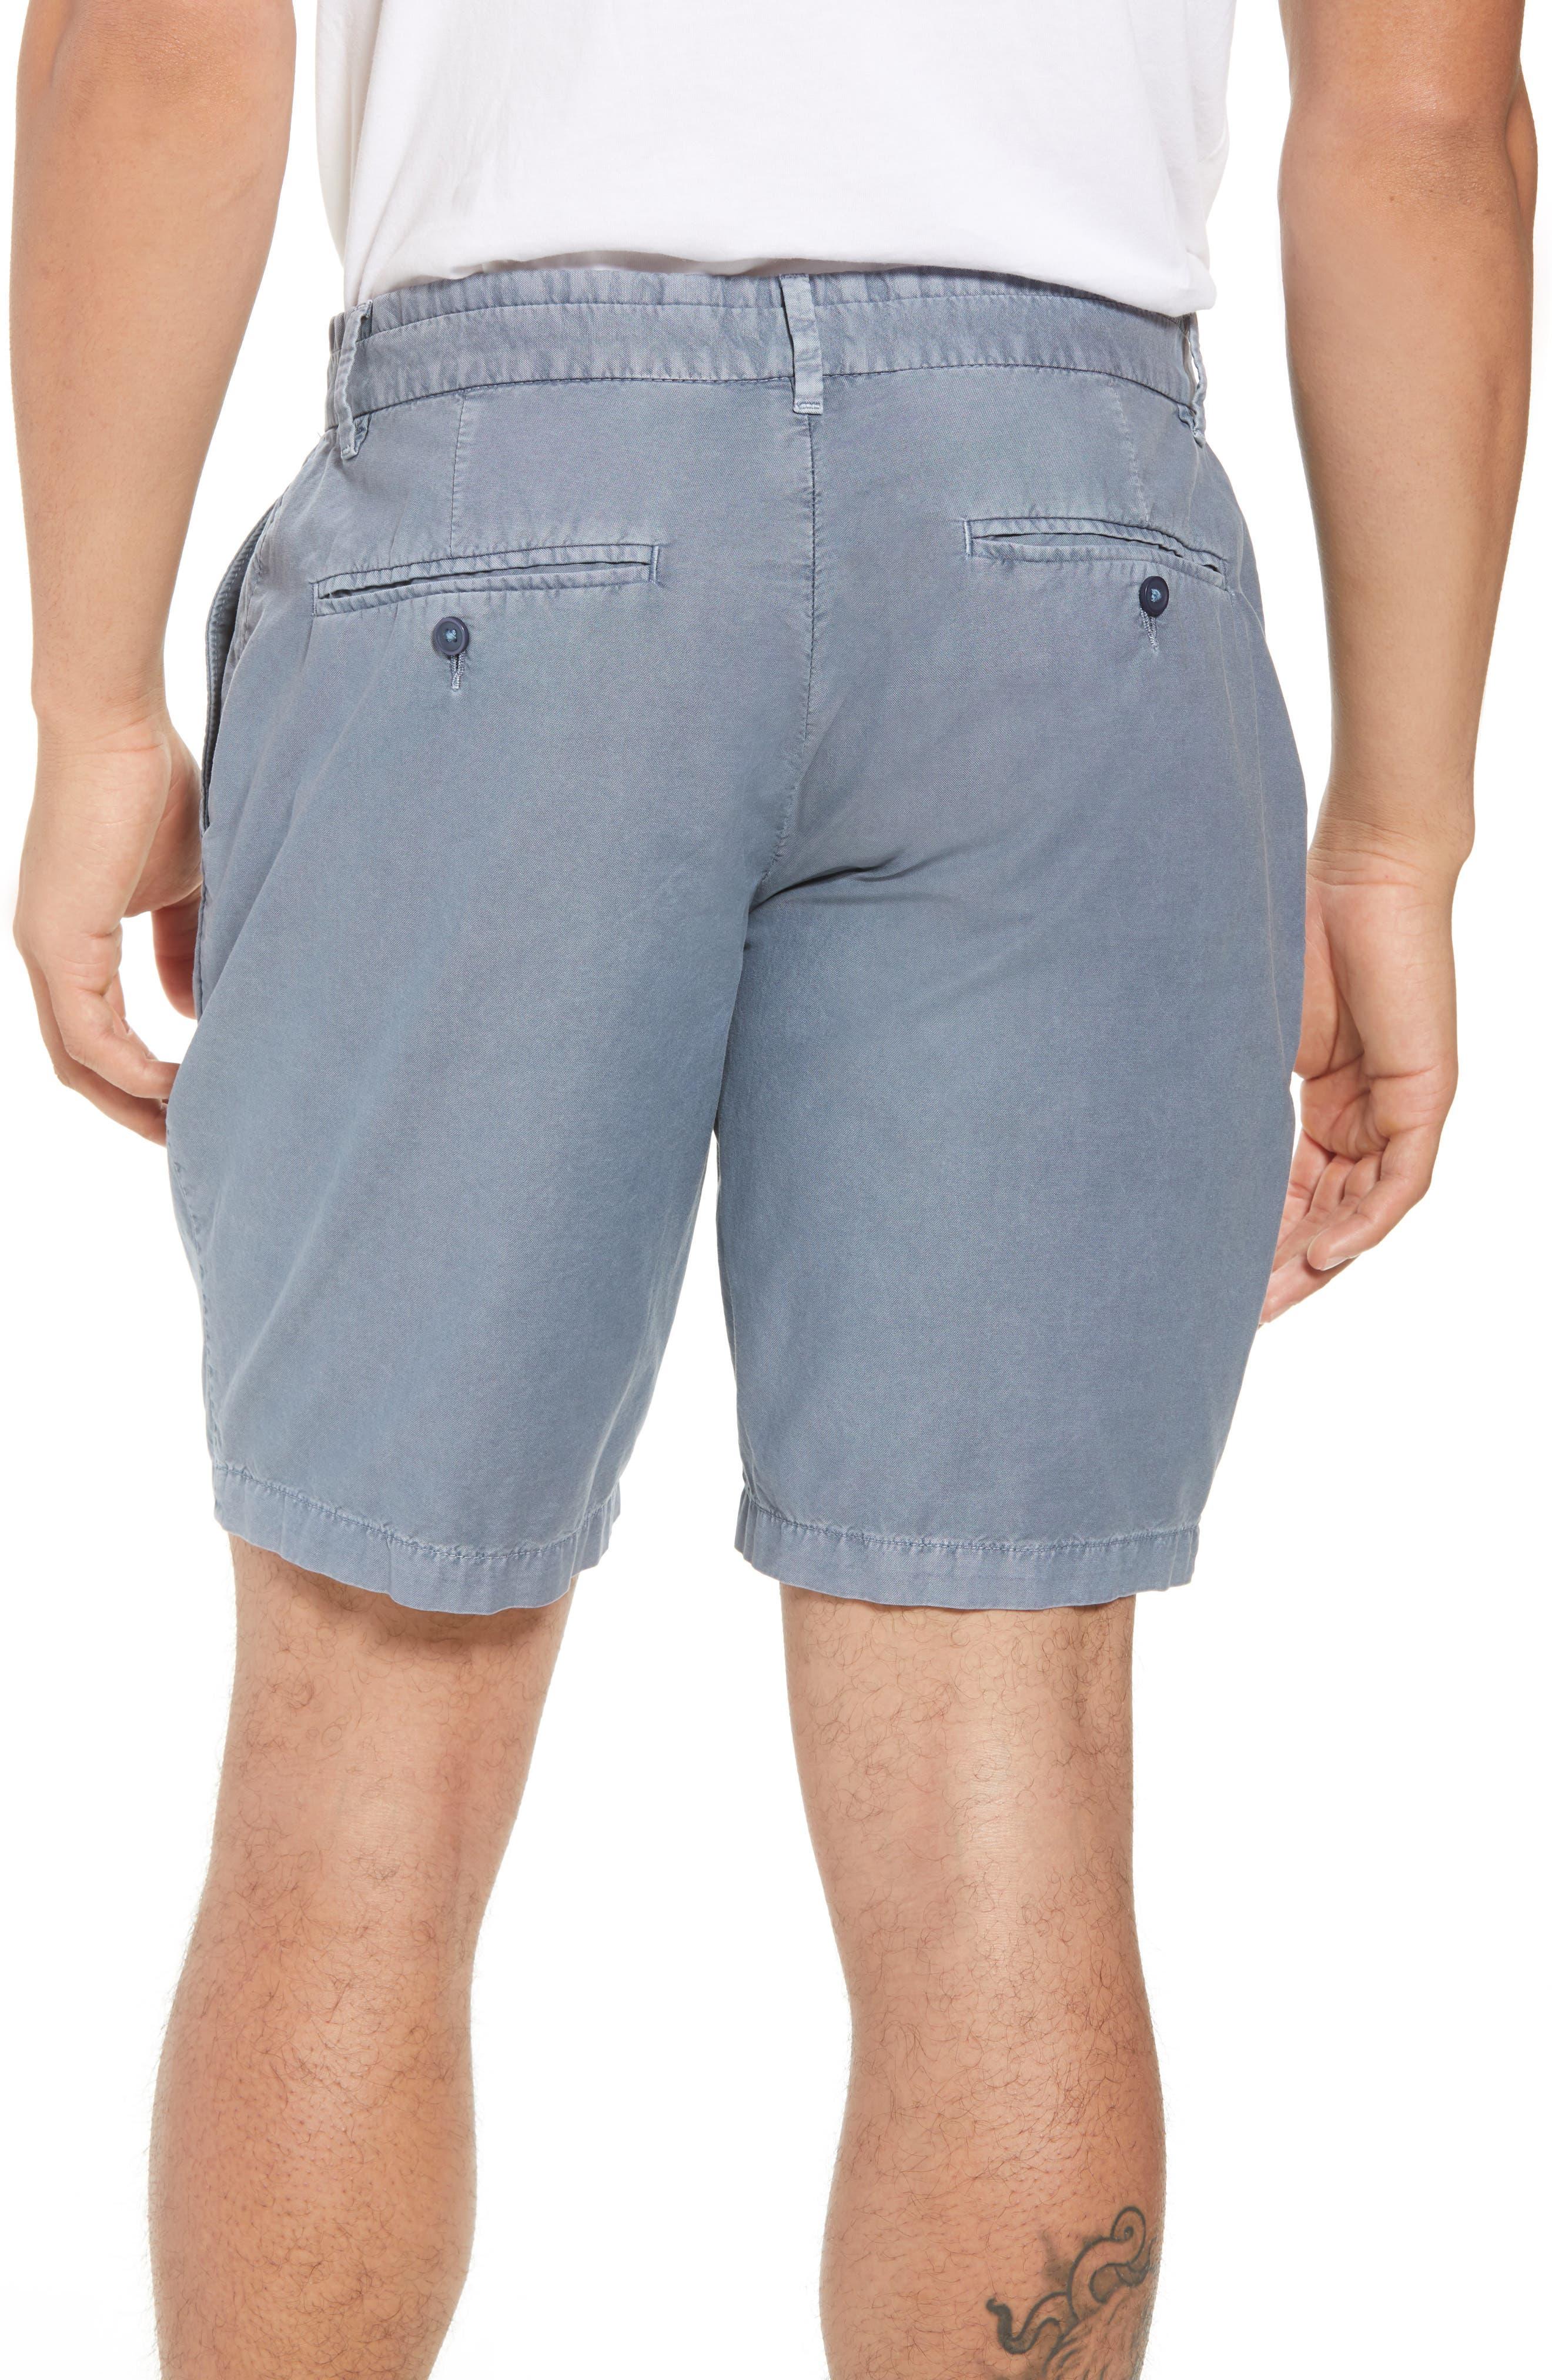 Butter Ball Shorts,                             Alternate thumbnail 2, color,                             BLUE SLATE